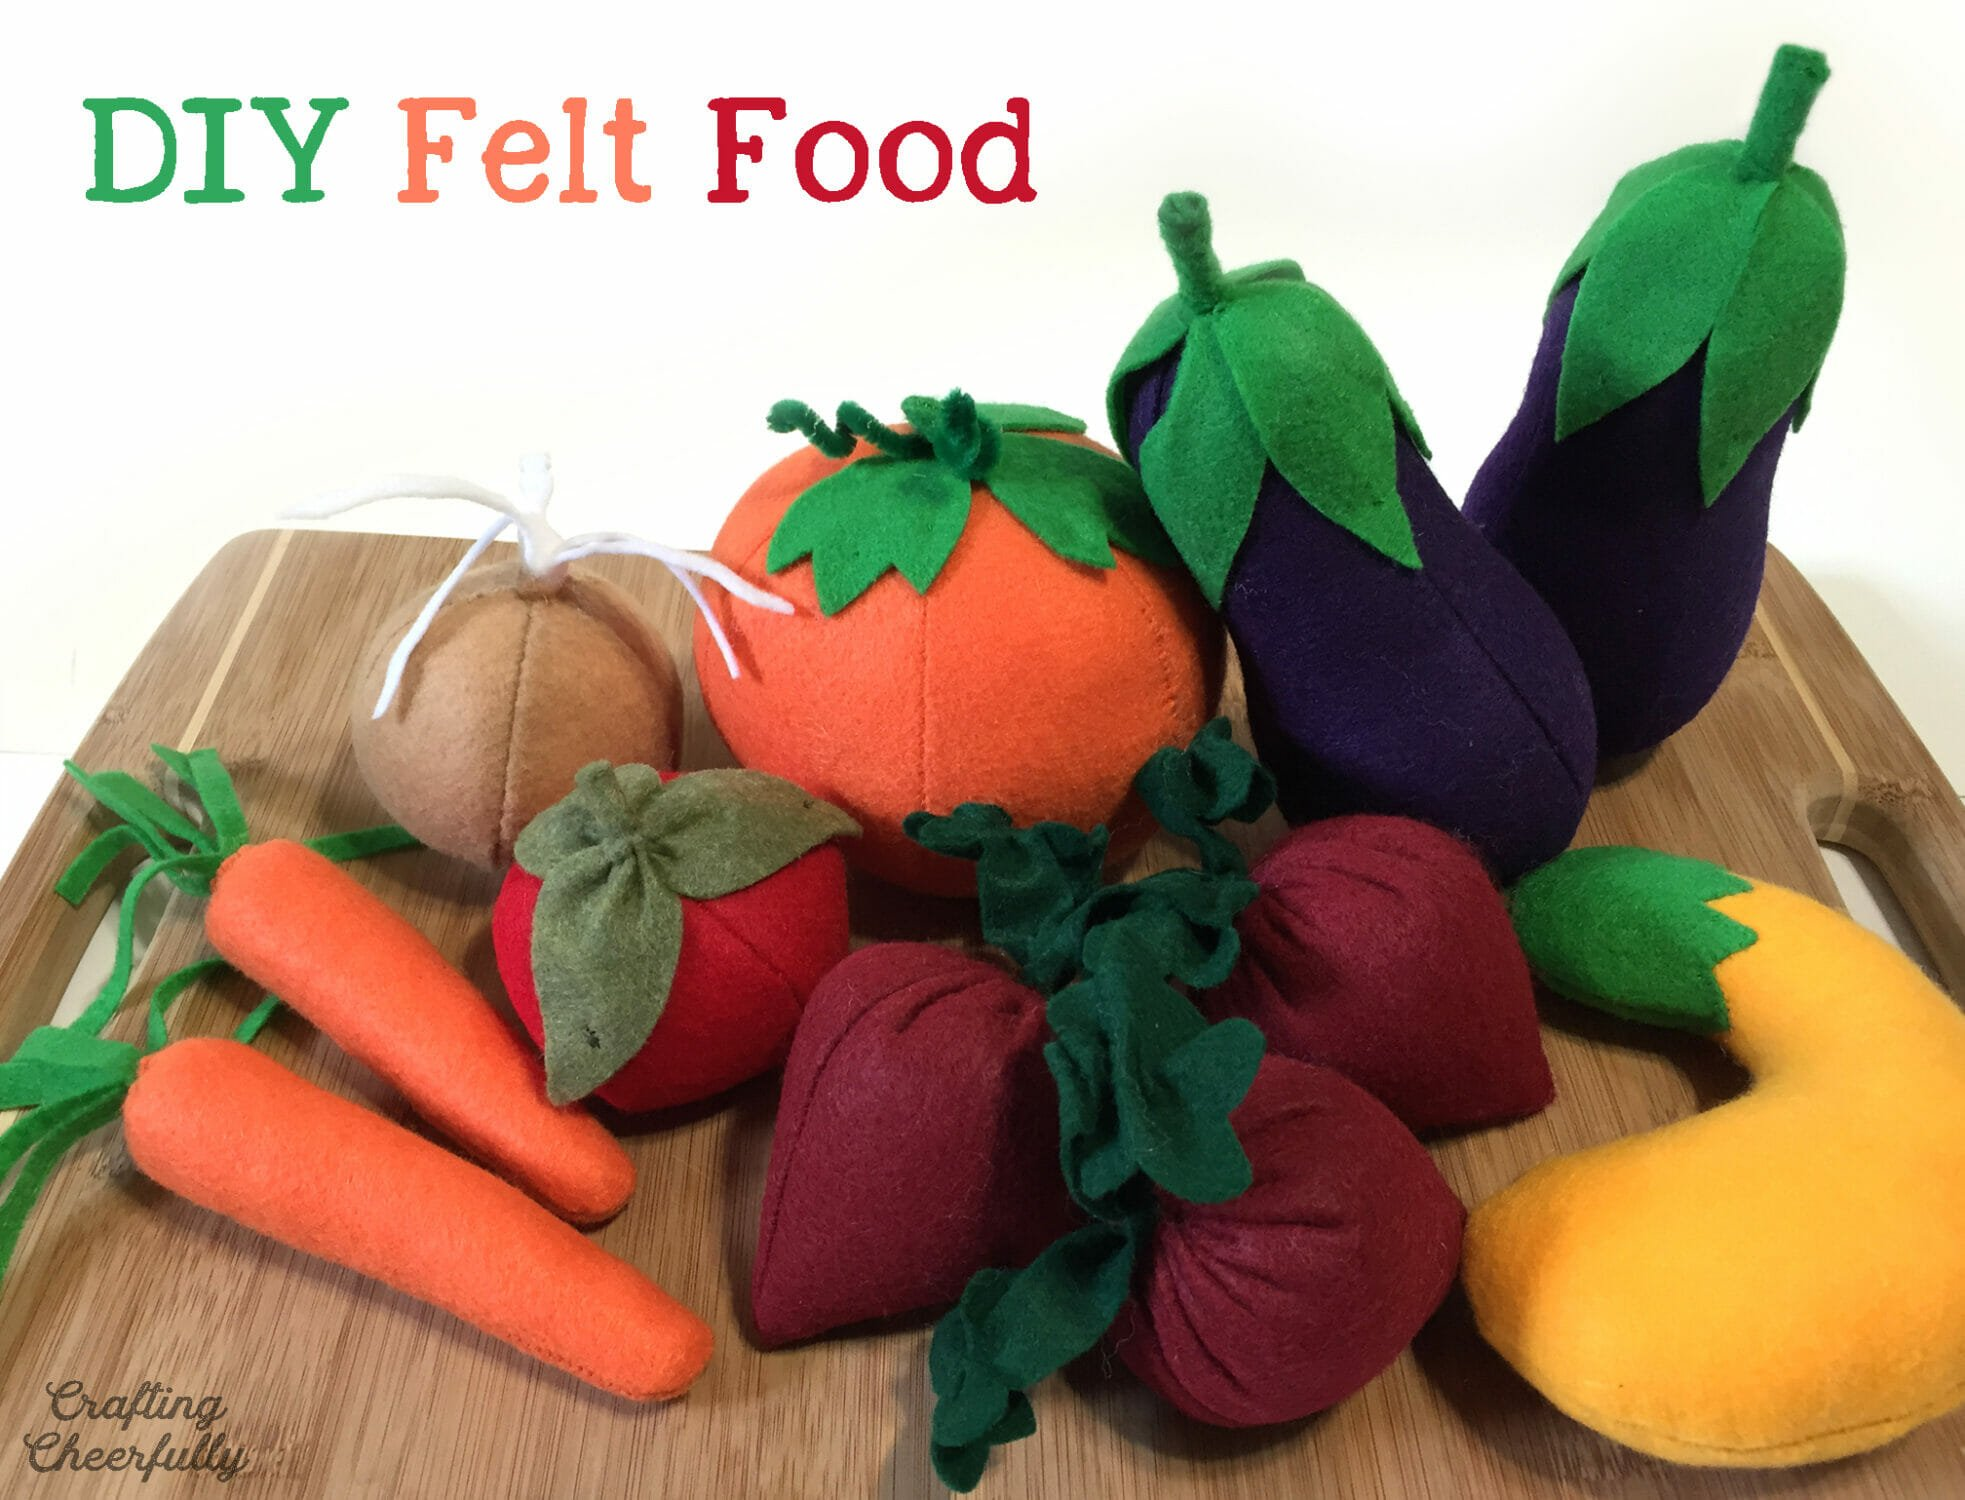 Handmade felt play food including vegetables, fruit, and bread.